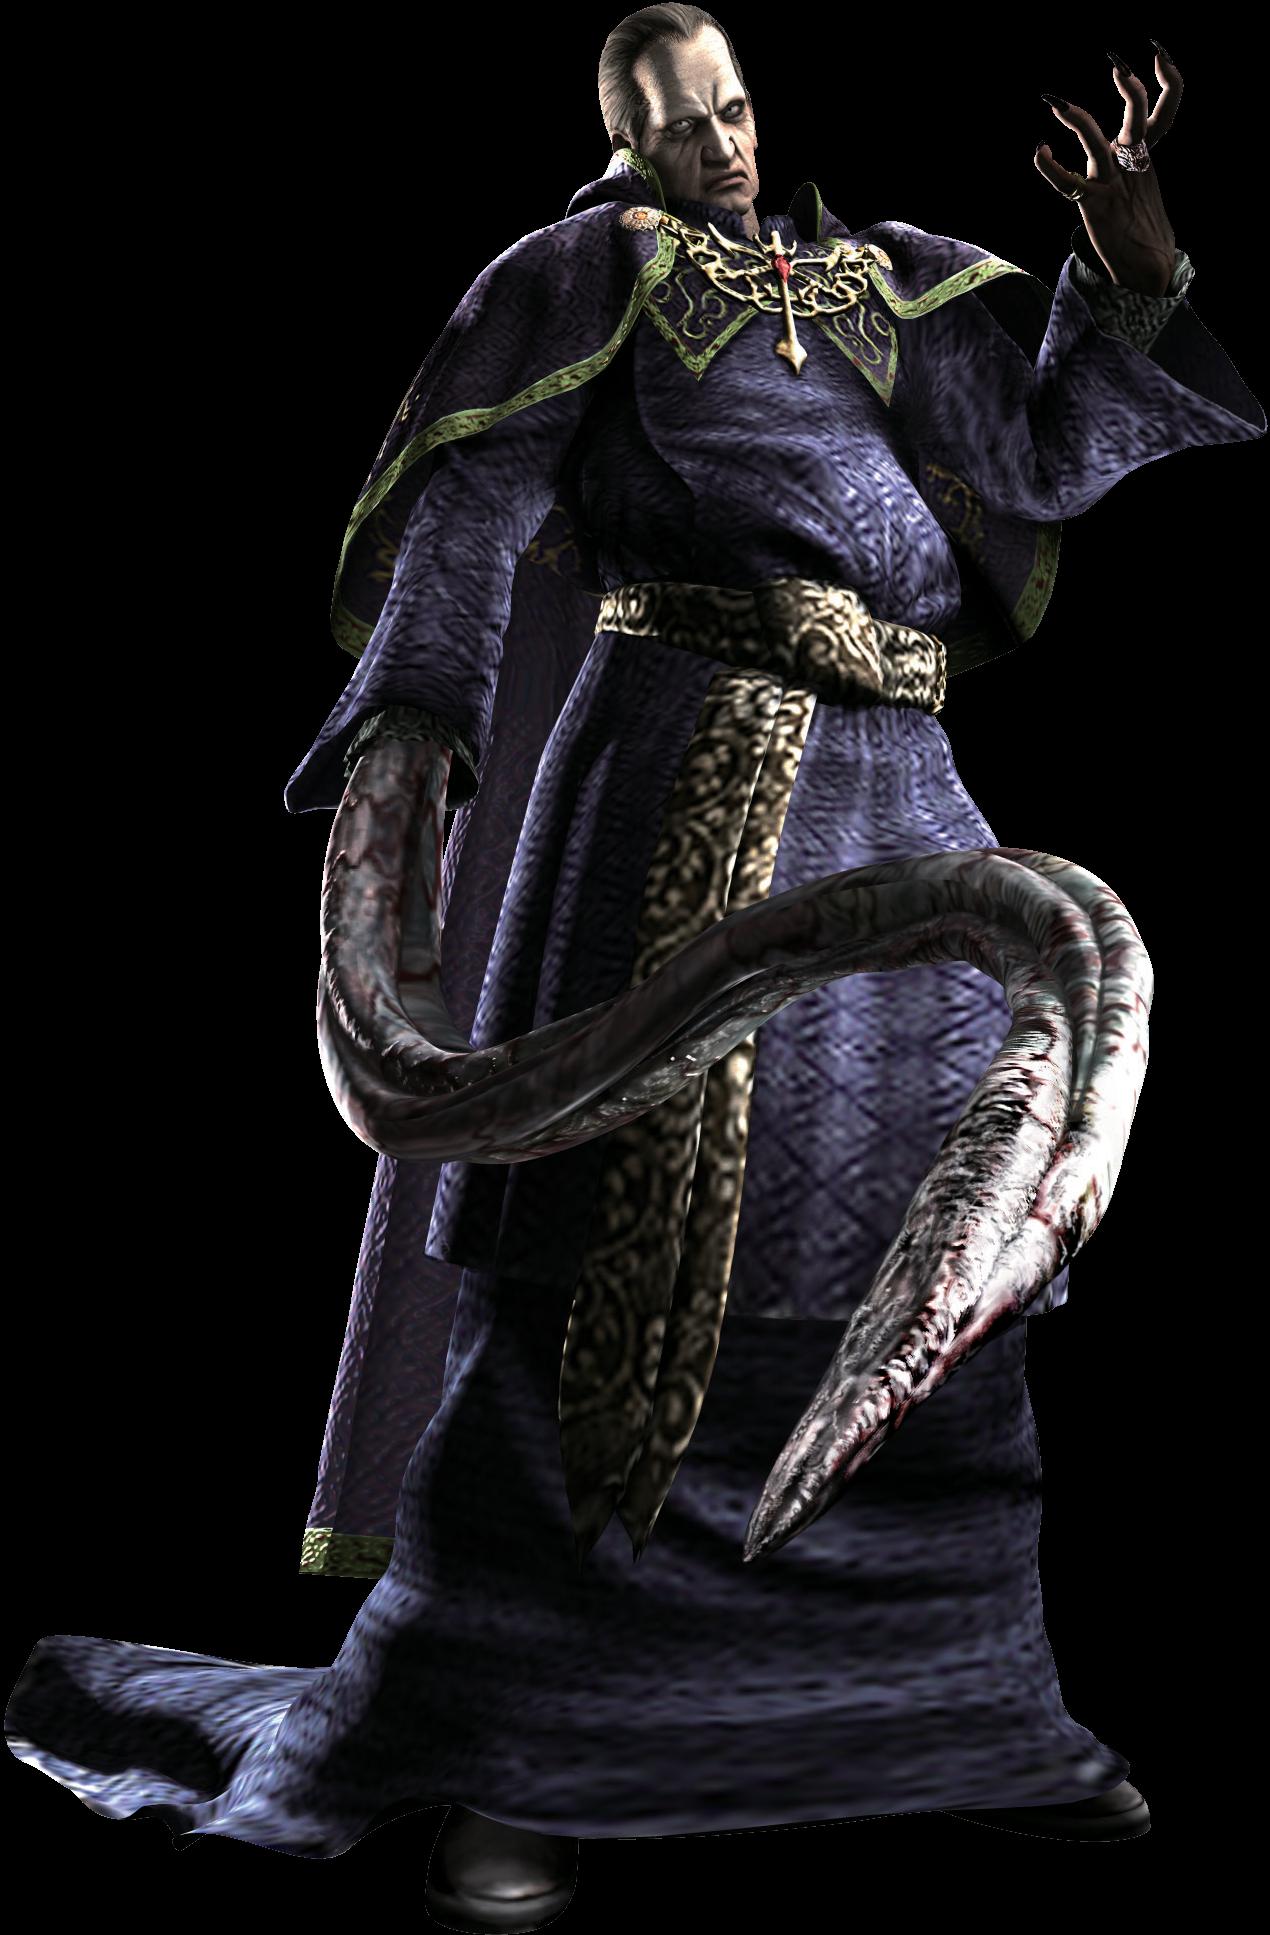 Osmund Saddler Re4 Resident Evil Resident Evil 5 King Of Fighters